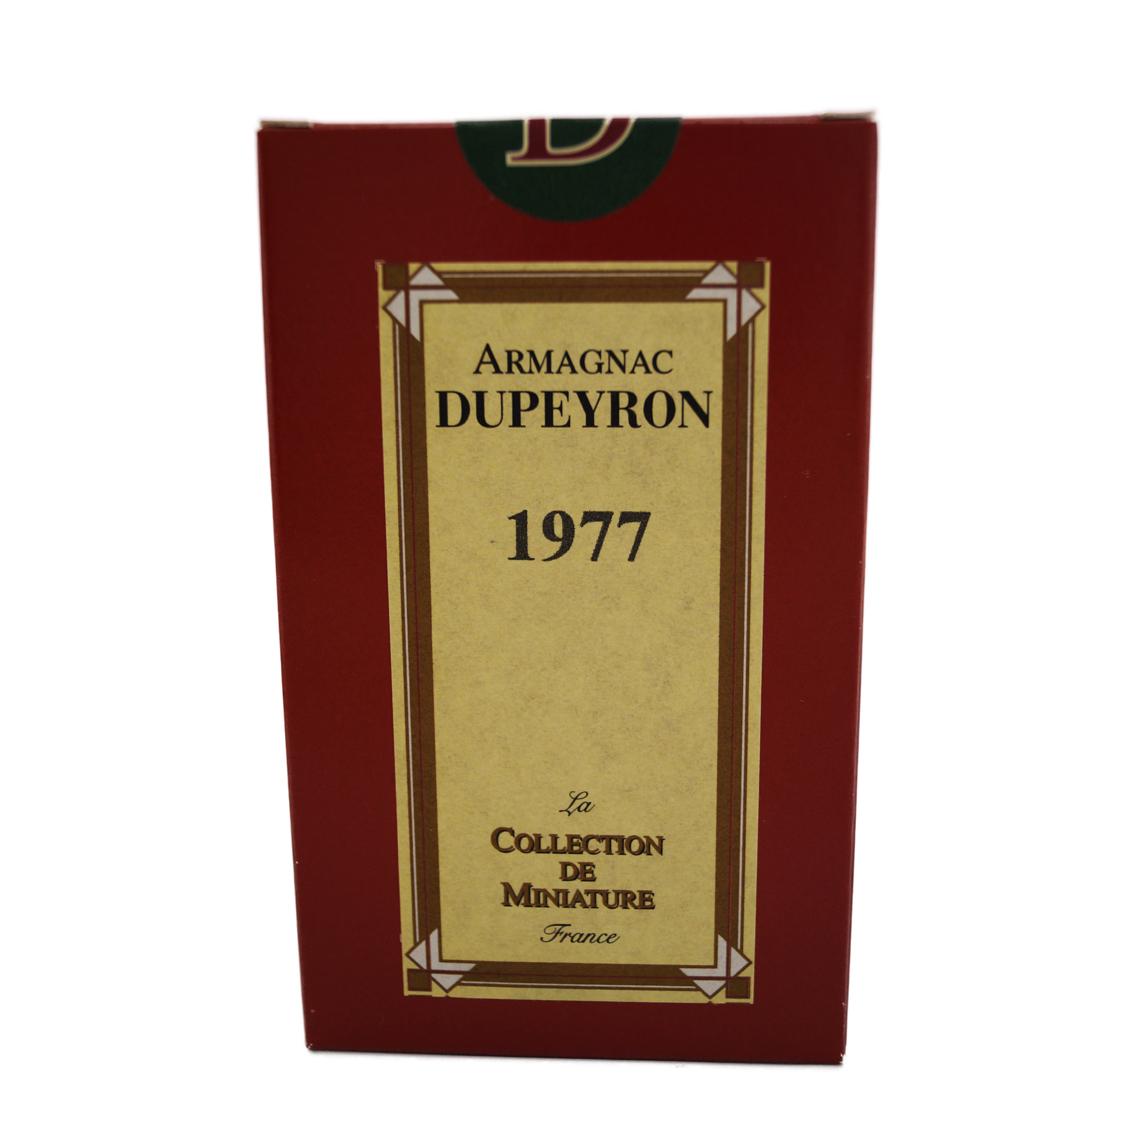 ARMAGNAC-DUPEYRON-1977-B